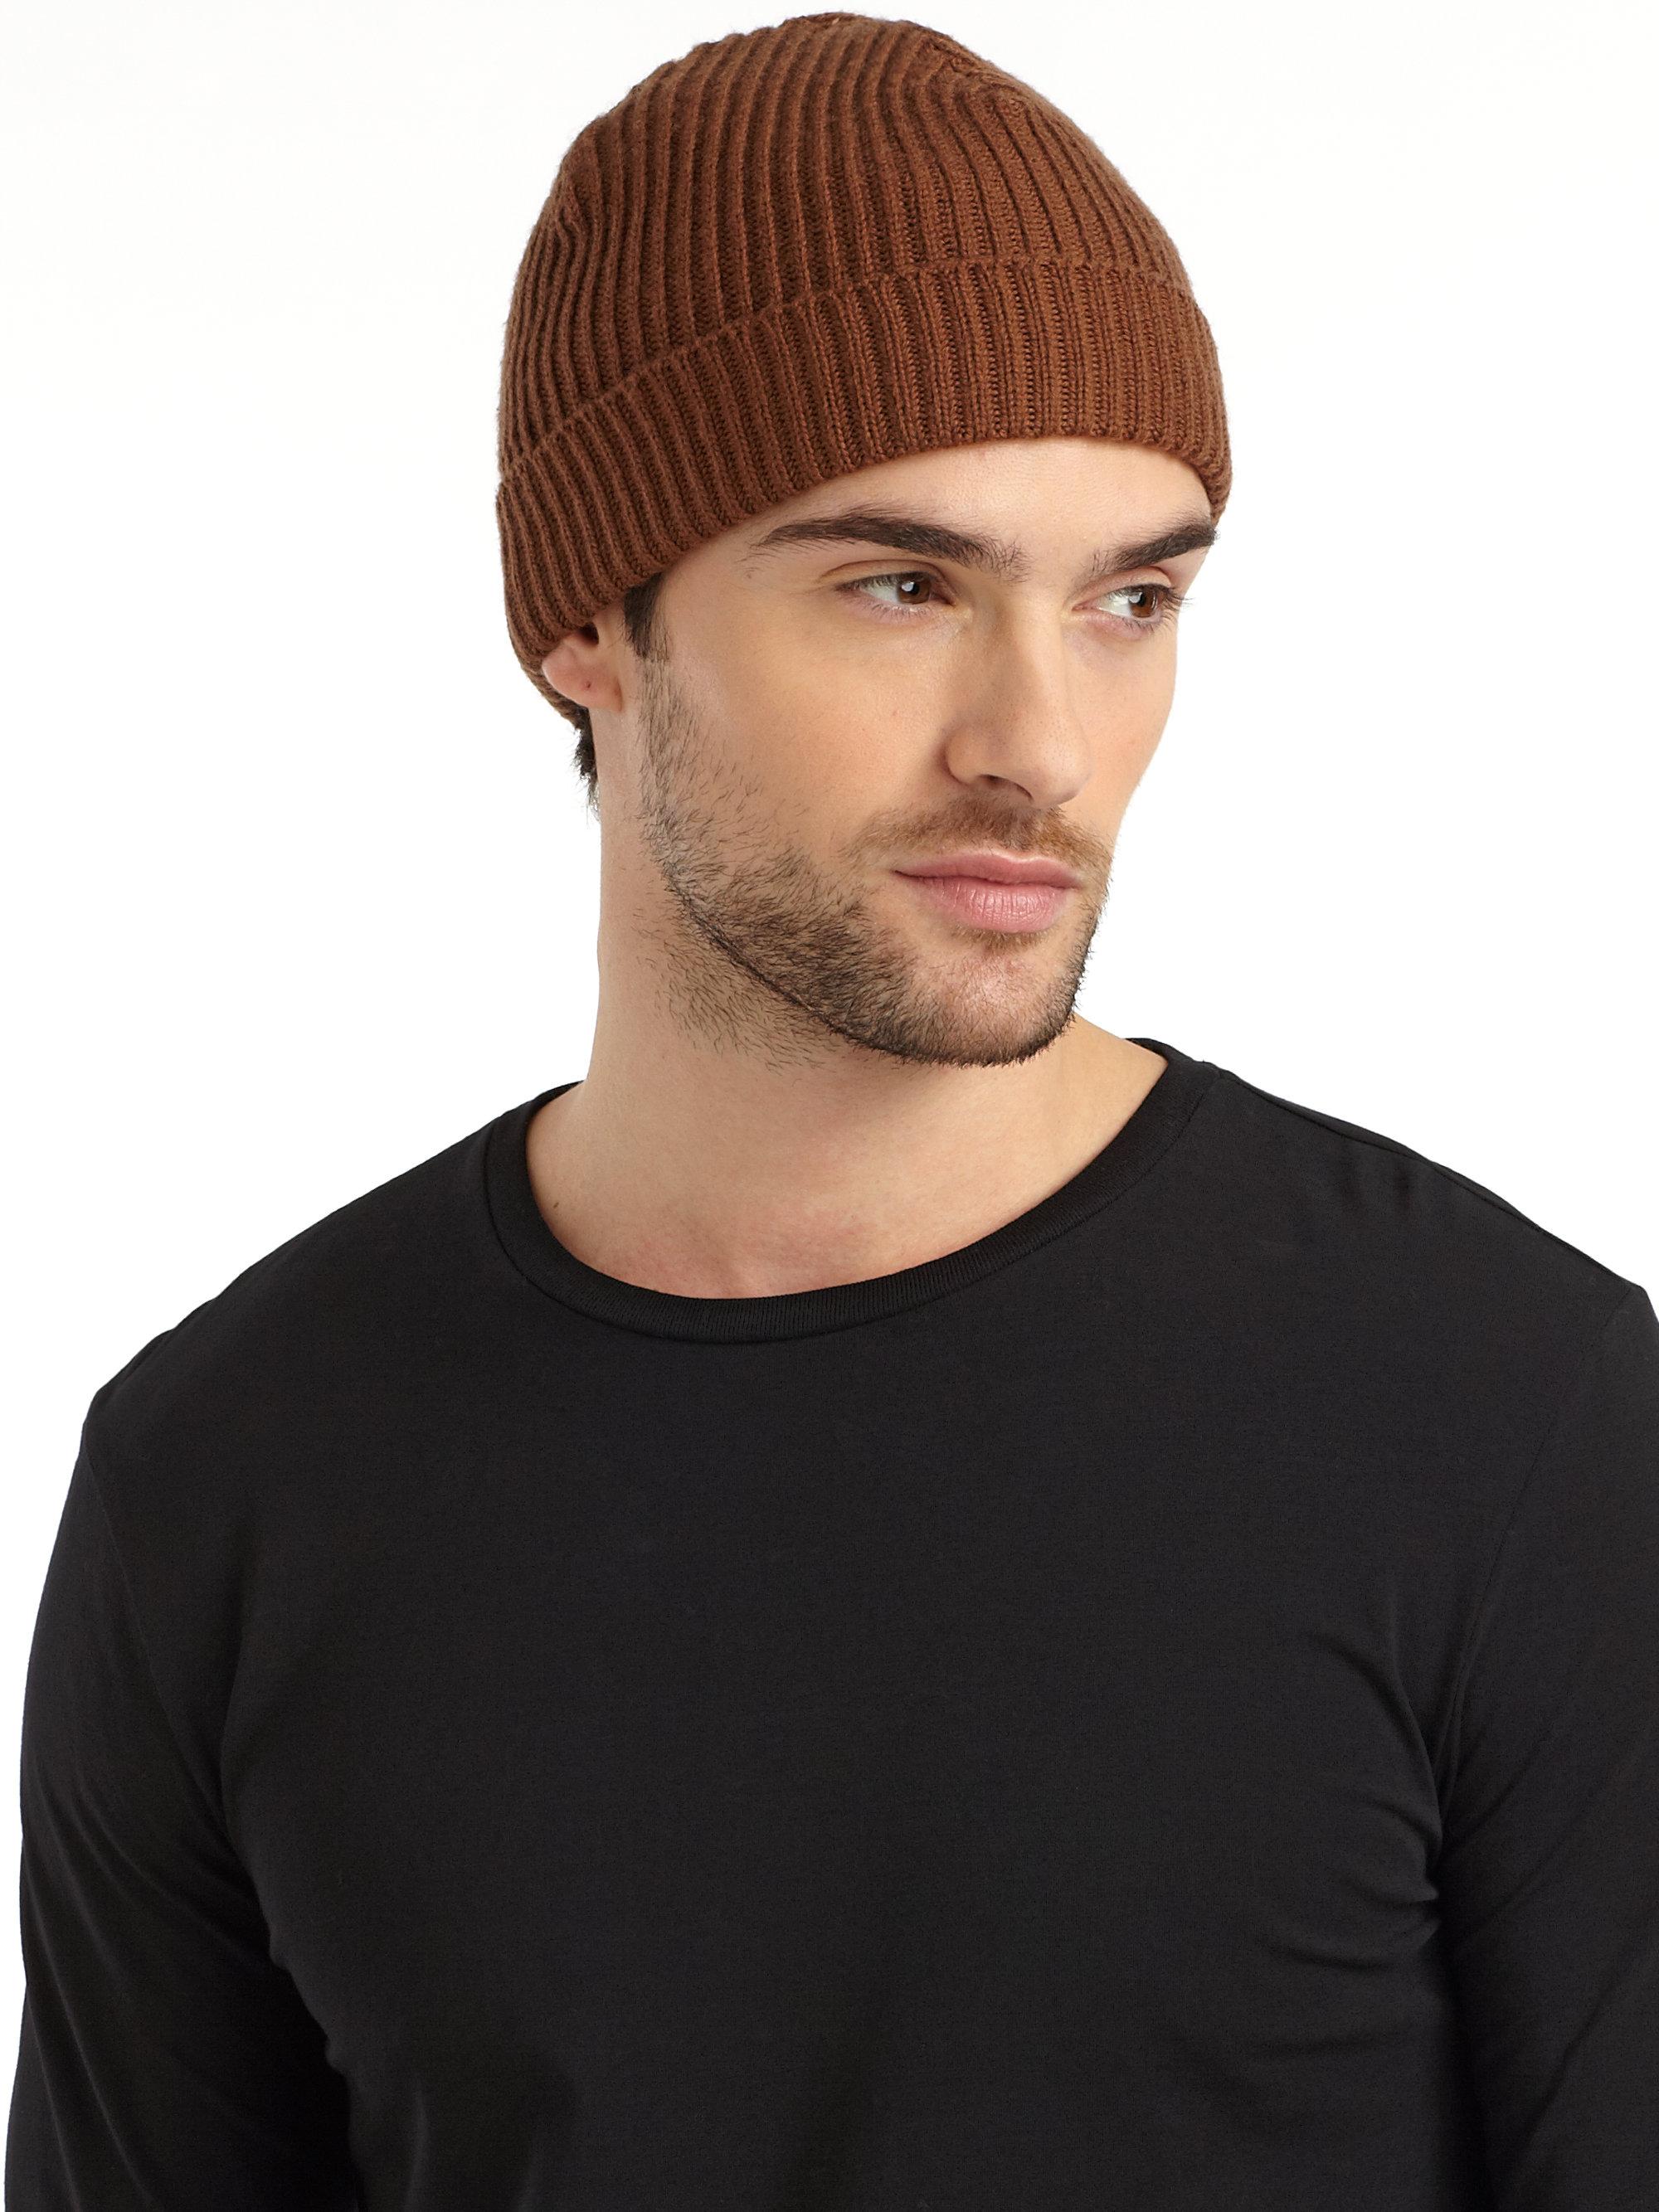 Lyst - Portolano Italian Merino Wool Ribbed Hat-toast in Brown for Men 782c707ae1b5